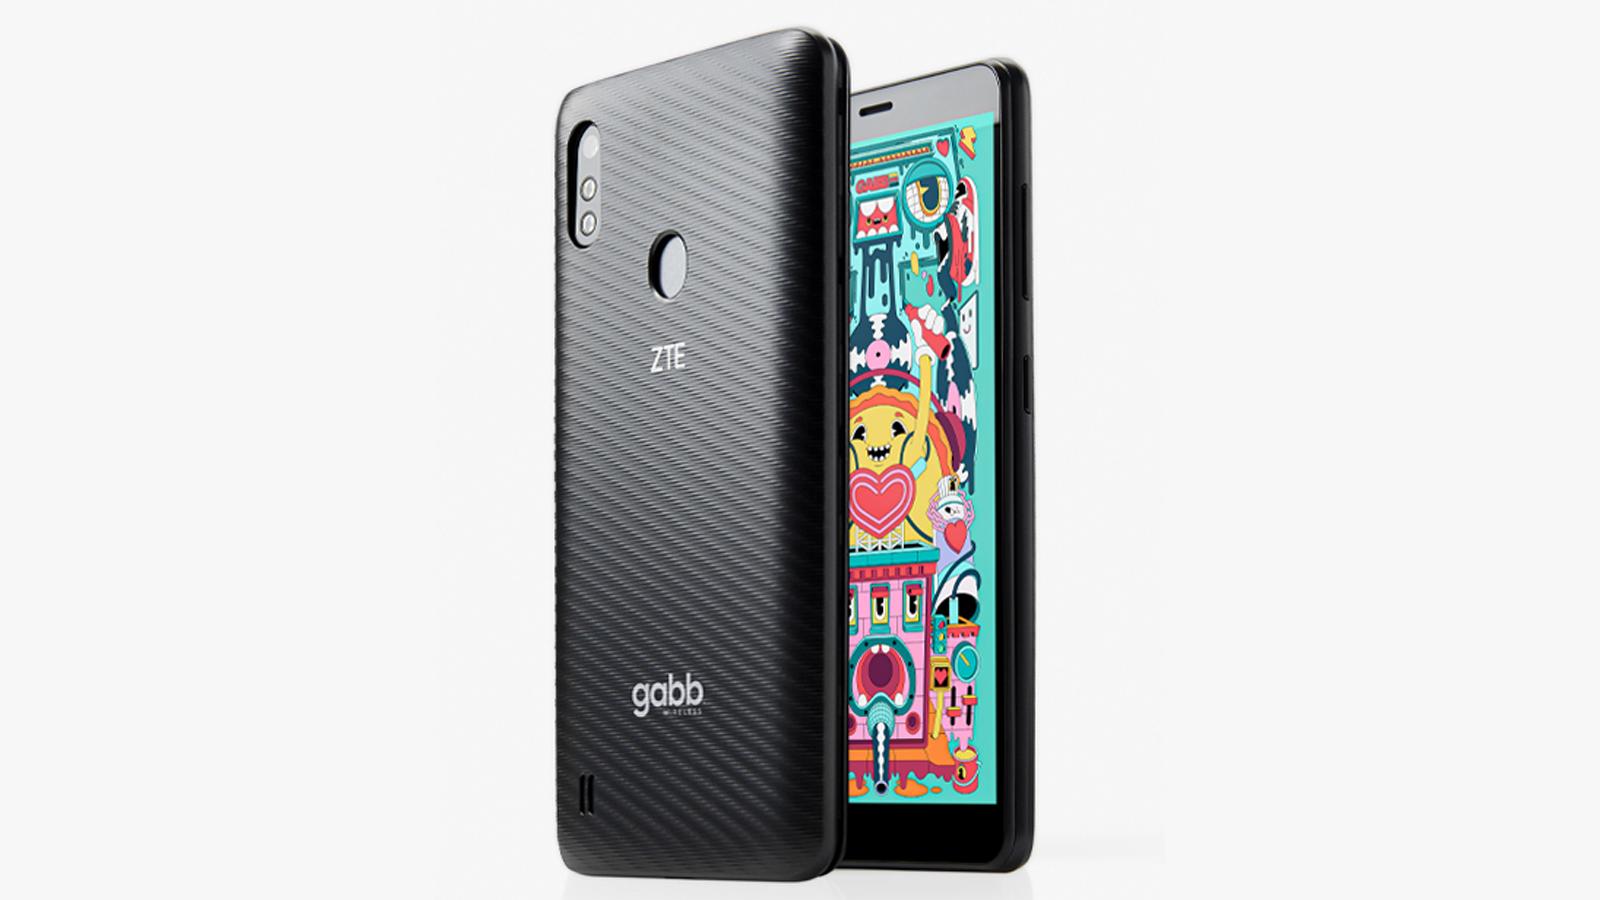 Gabb Z2 kid-friendly phone